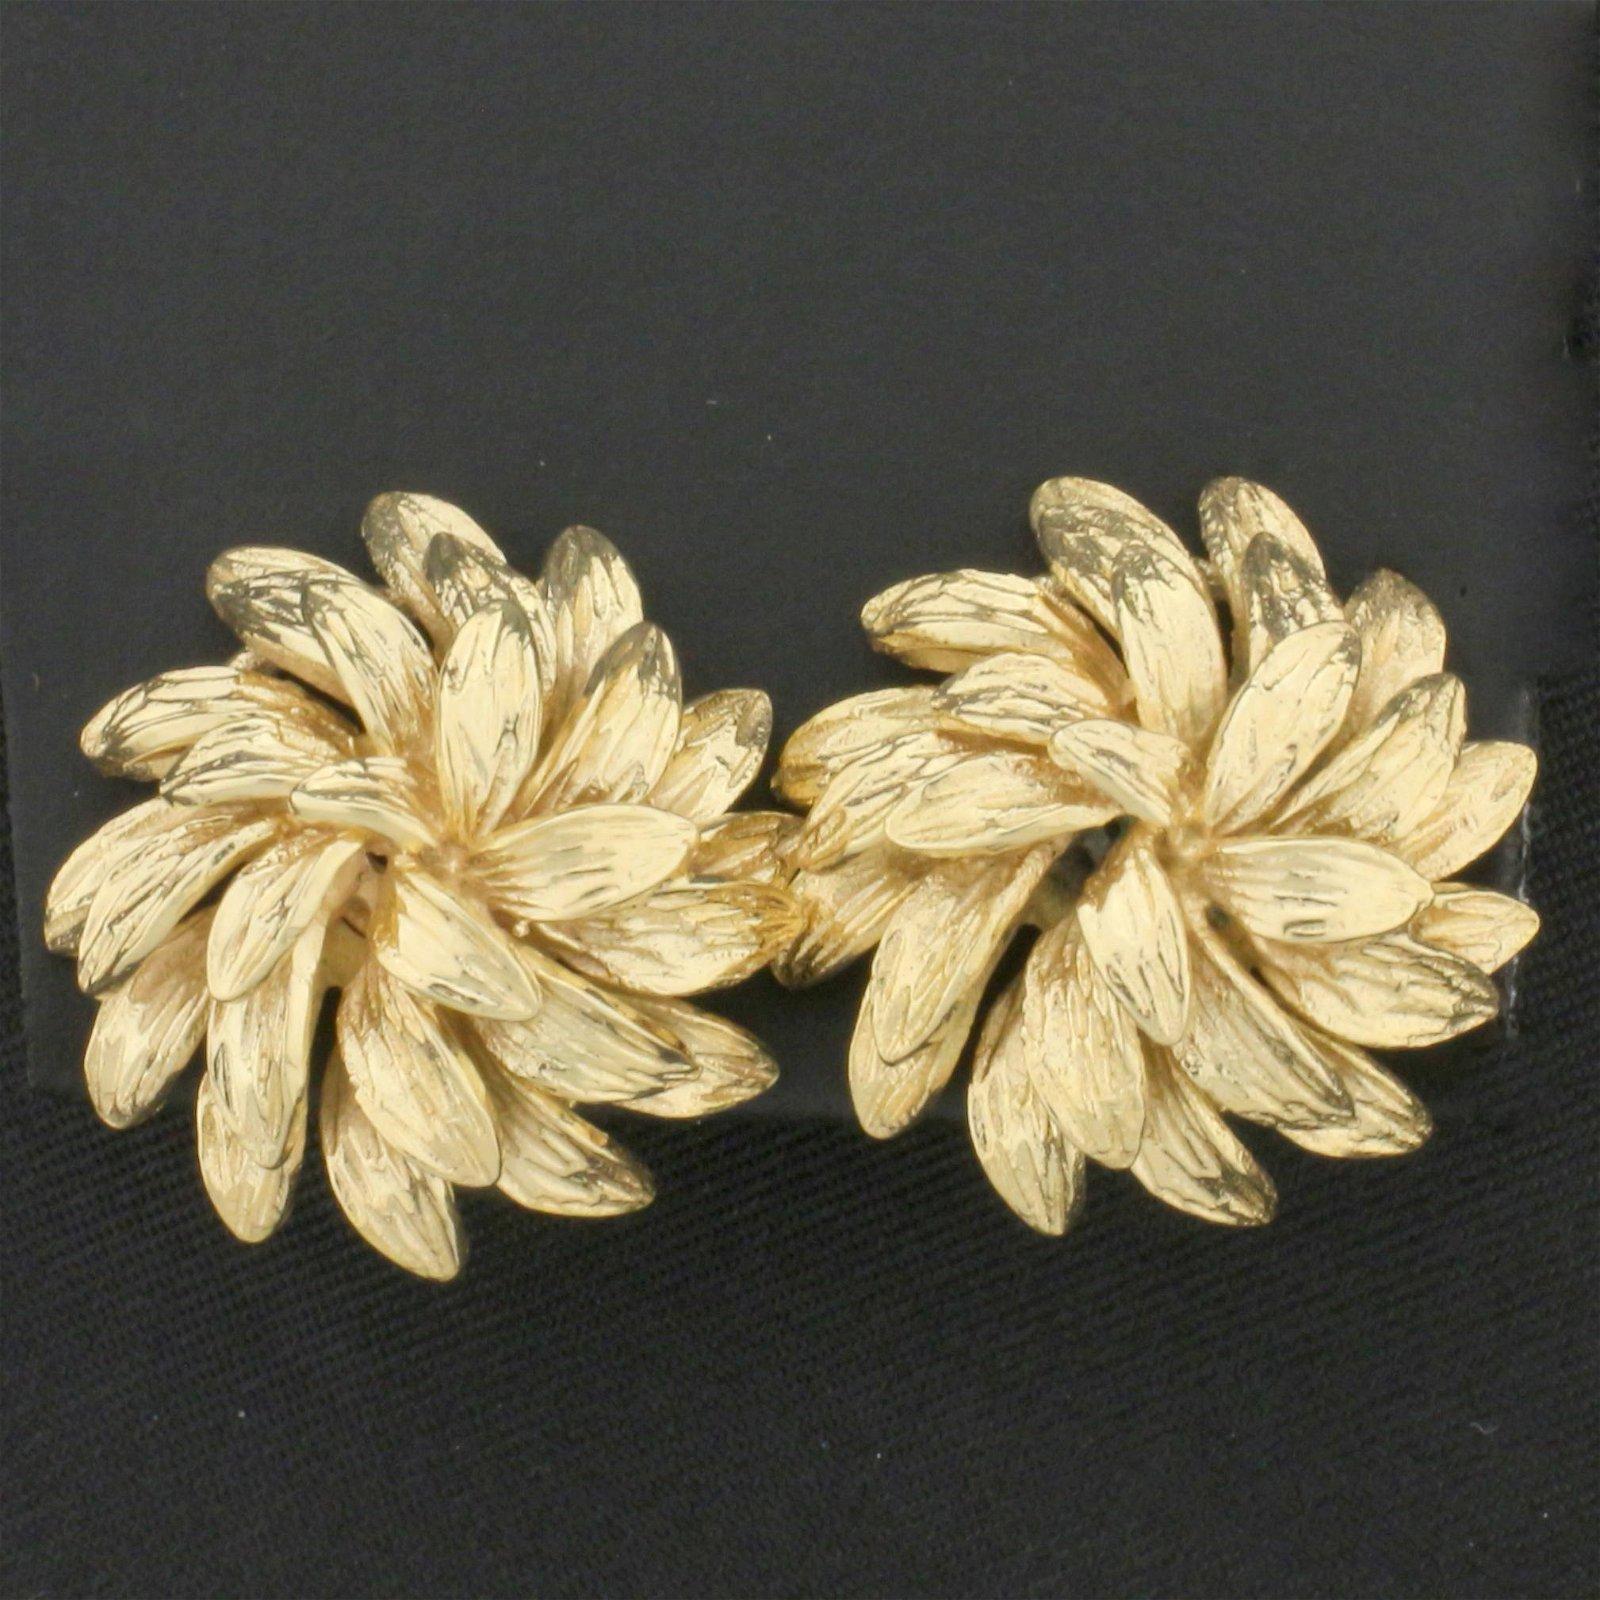 Leaf Nature Design Earrings for Non-Pierced Ears in 14K